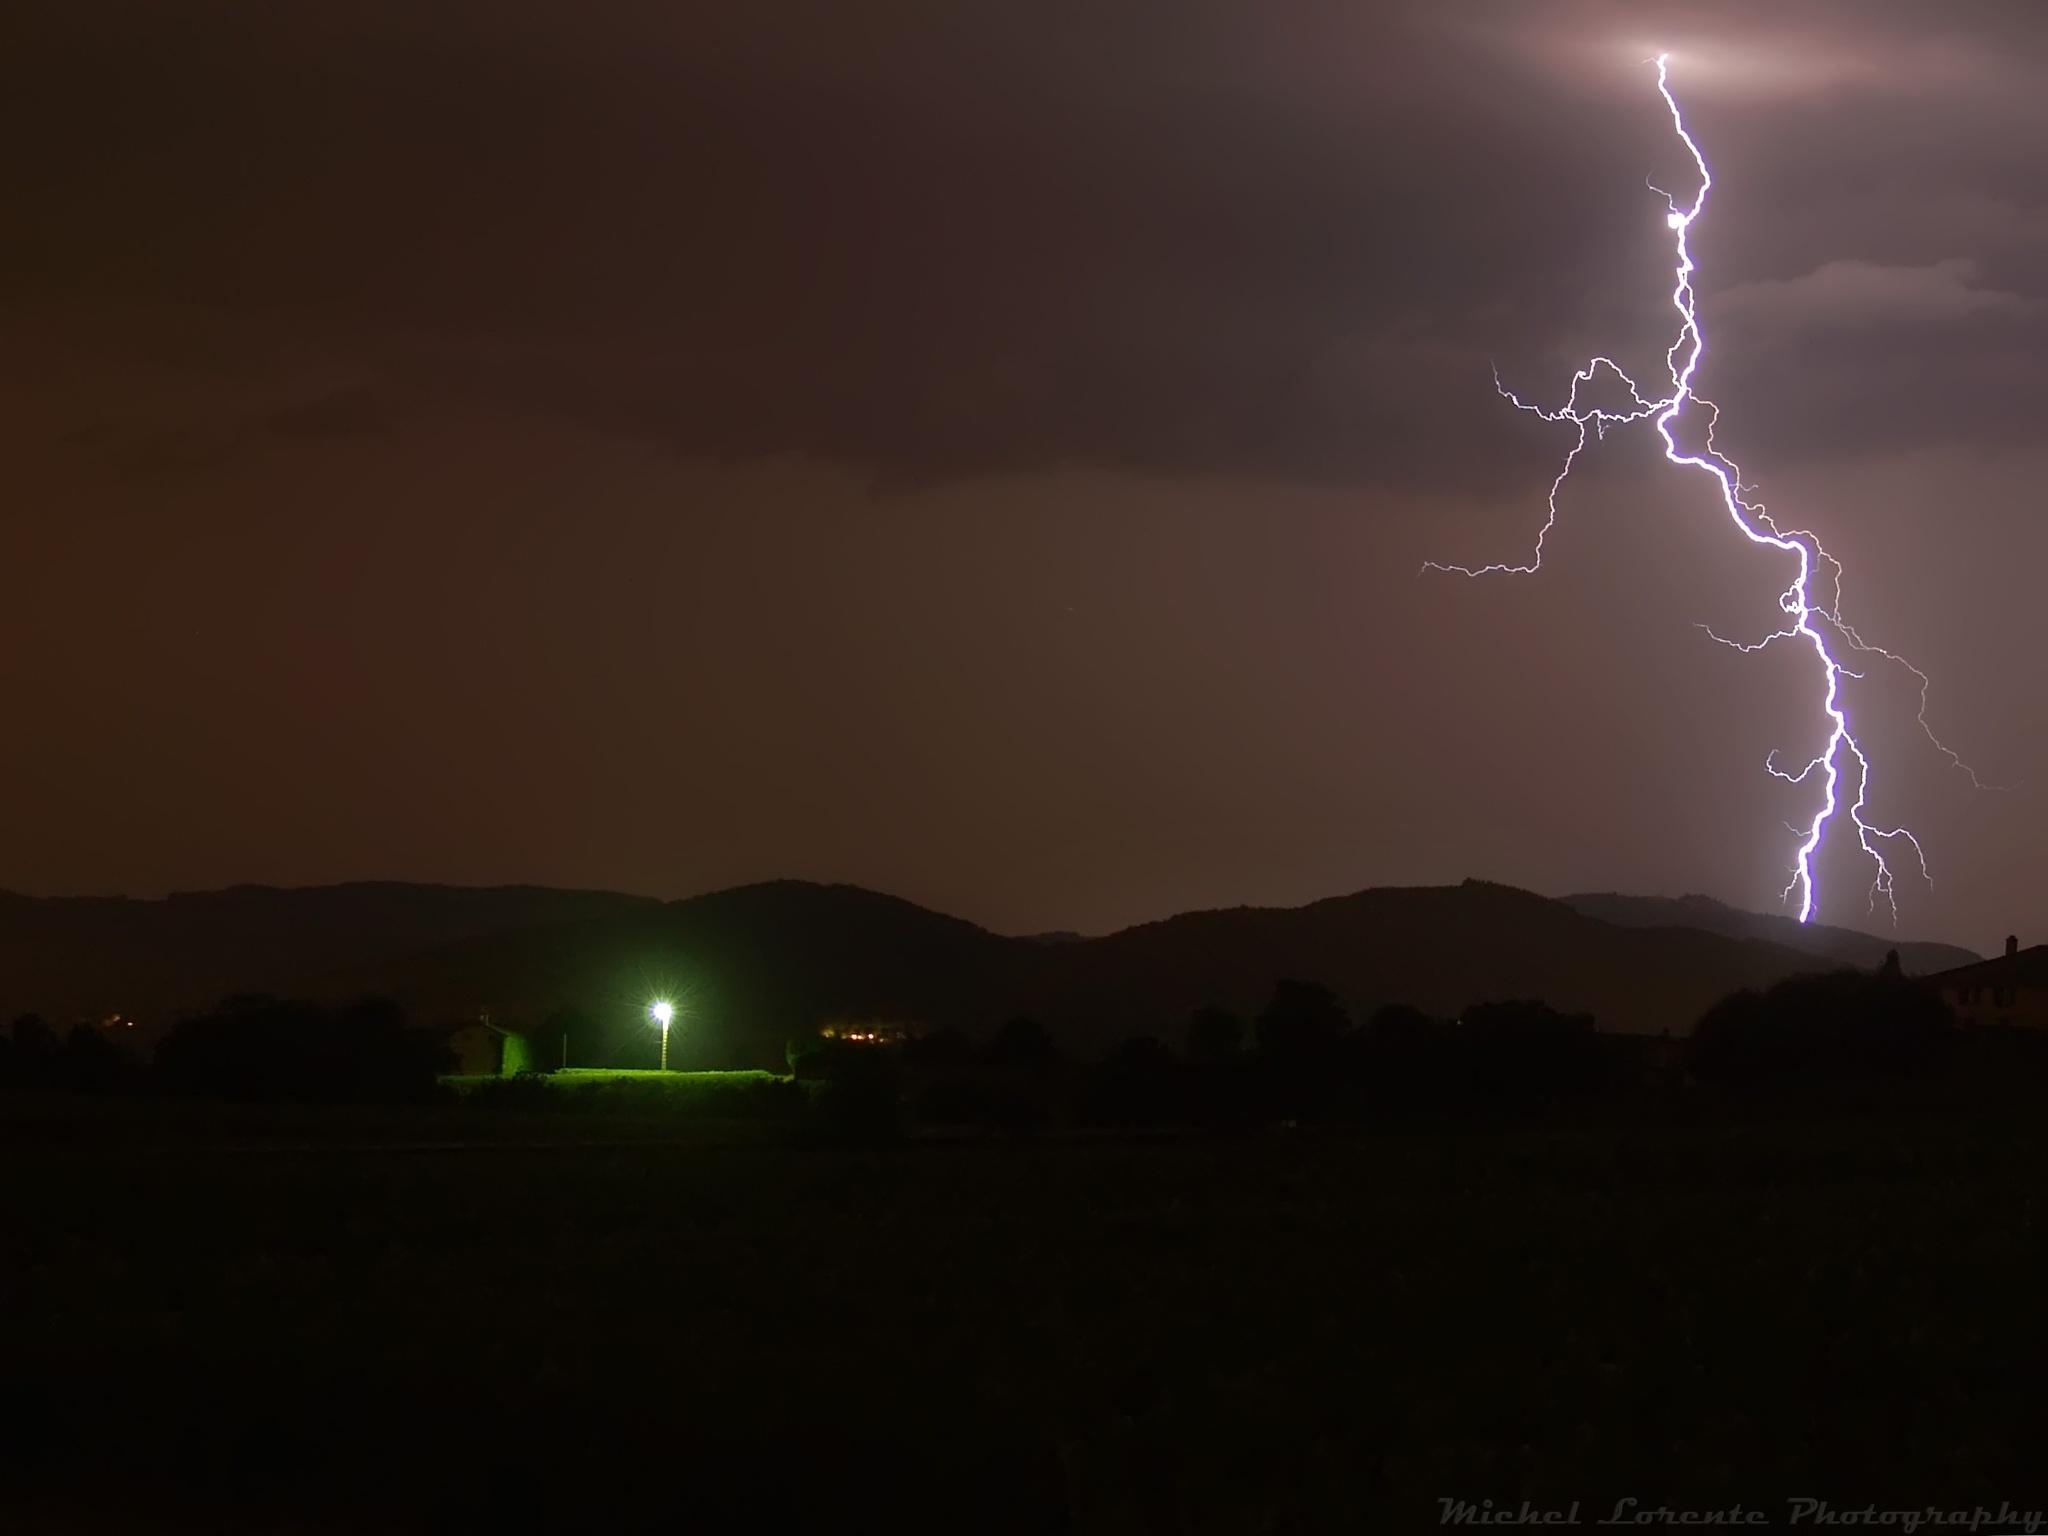 Streetlight vs Lightning by Milore